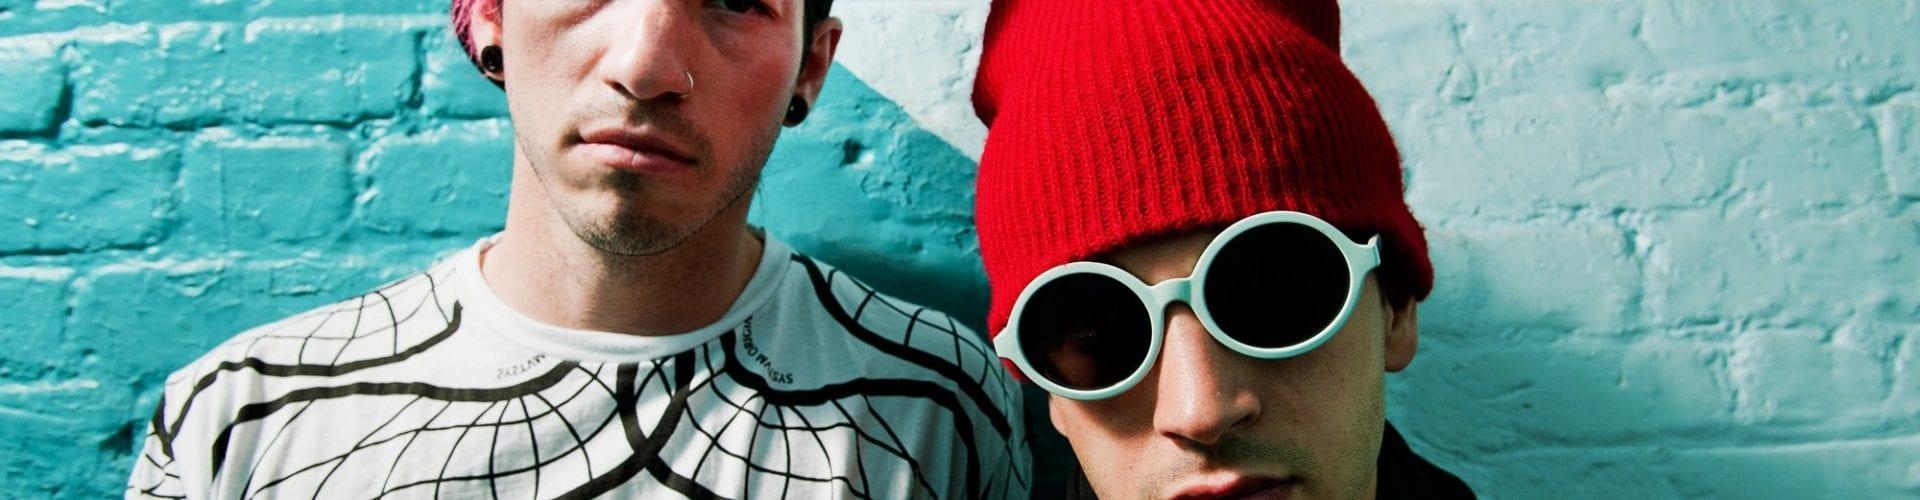 Twenty One Pilots Add New Dates To 'The Bandito Tour'